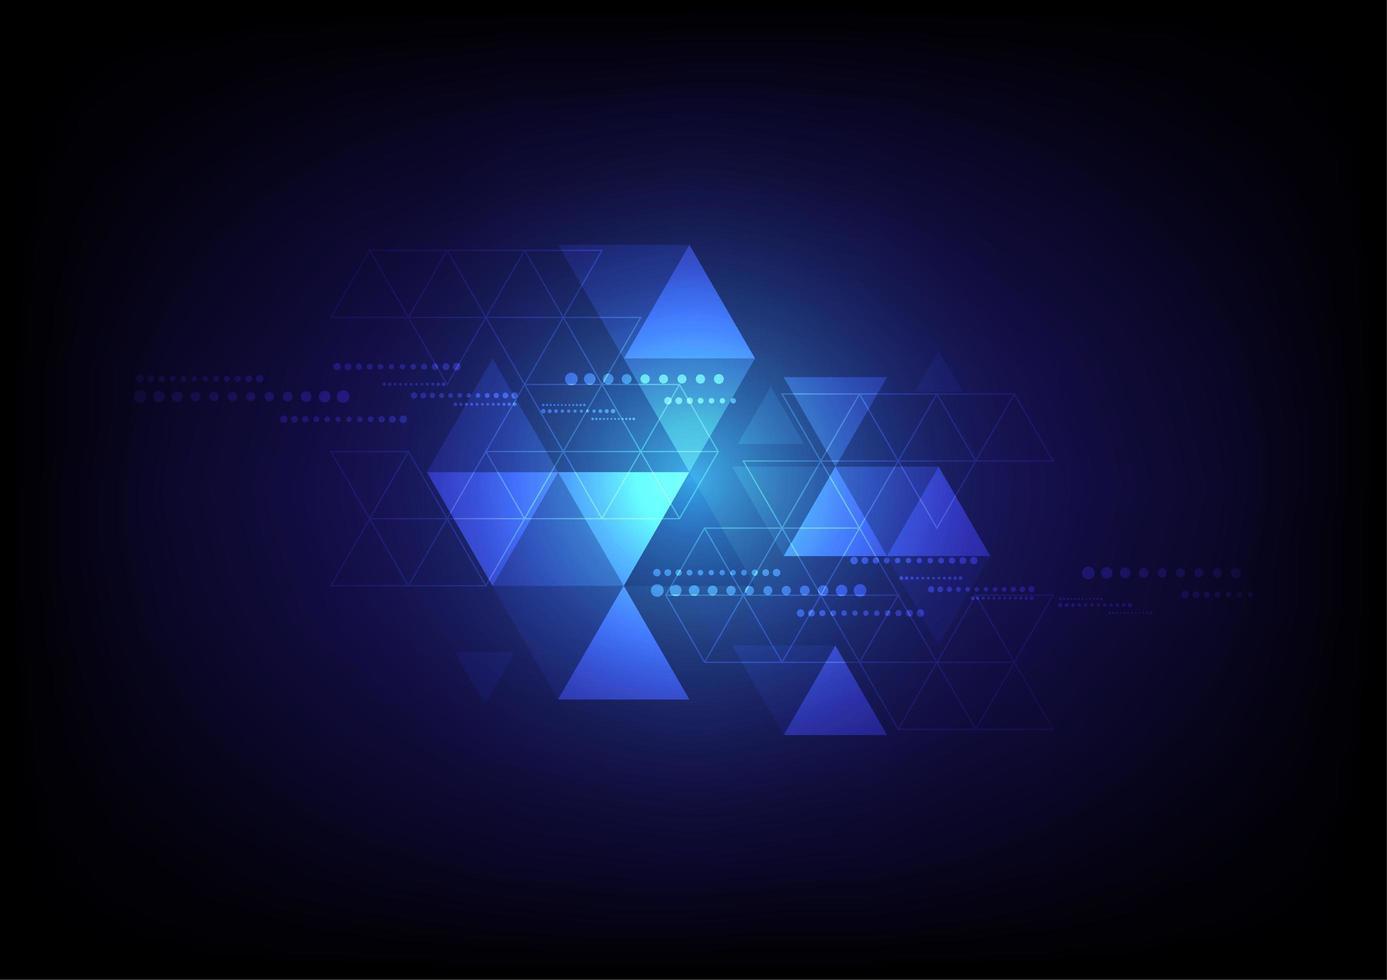 blauwe gloeiende driehoek achtergrond vector